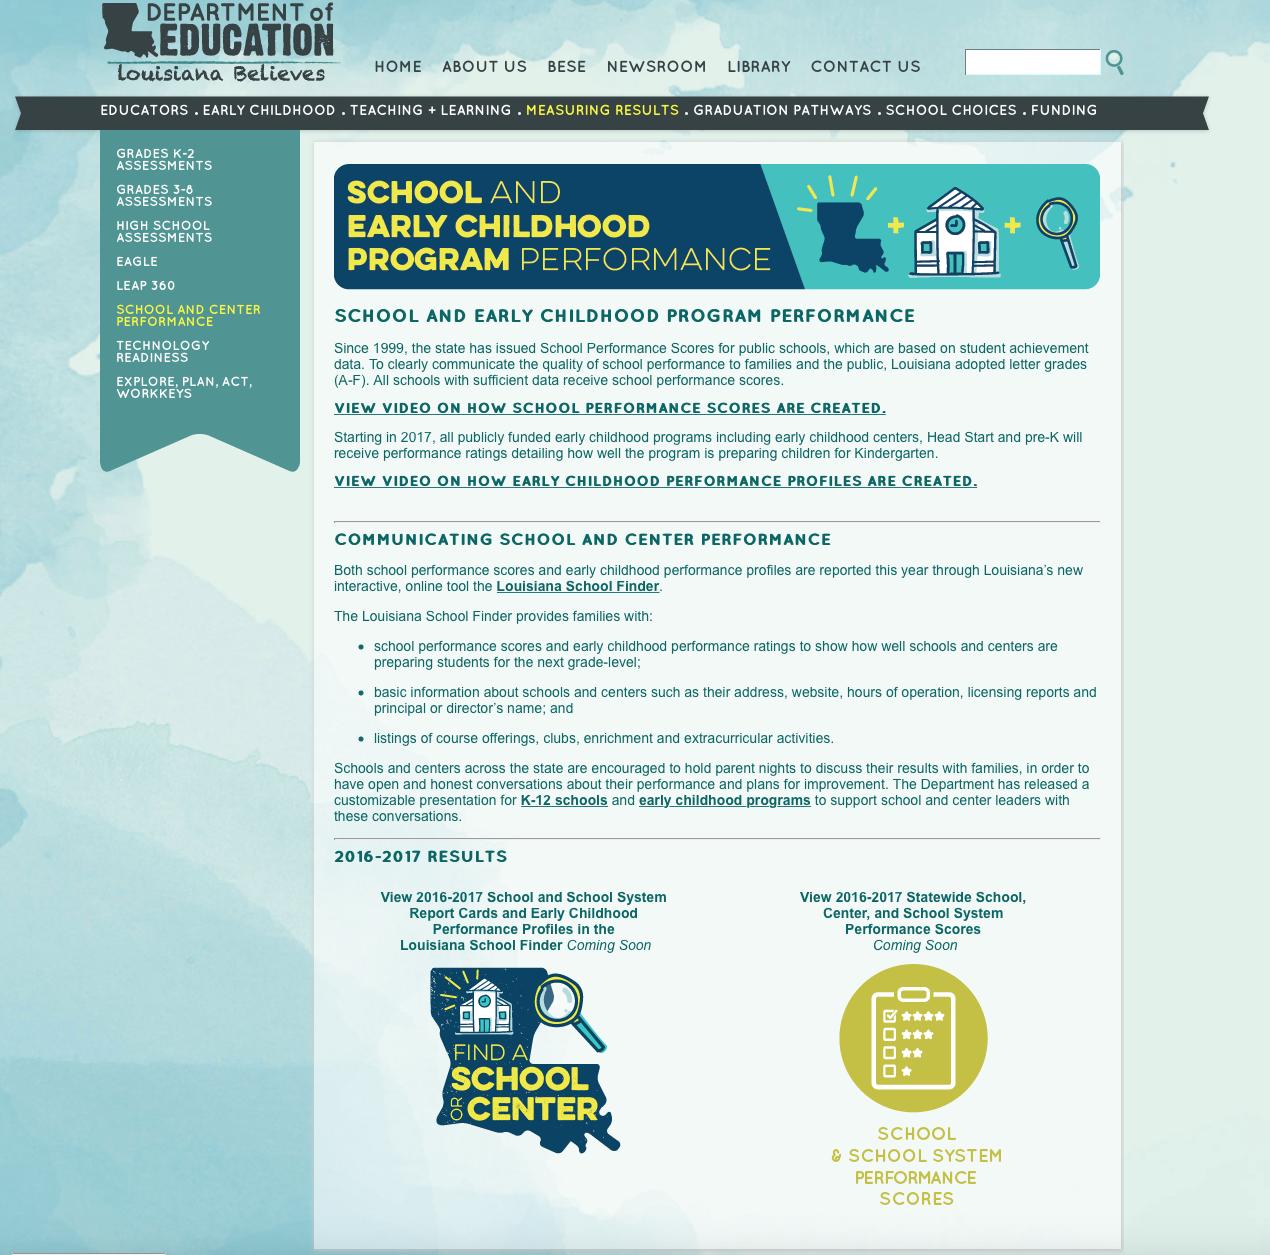 Professional editing service website